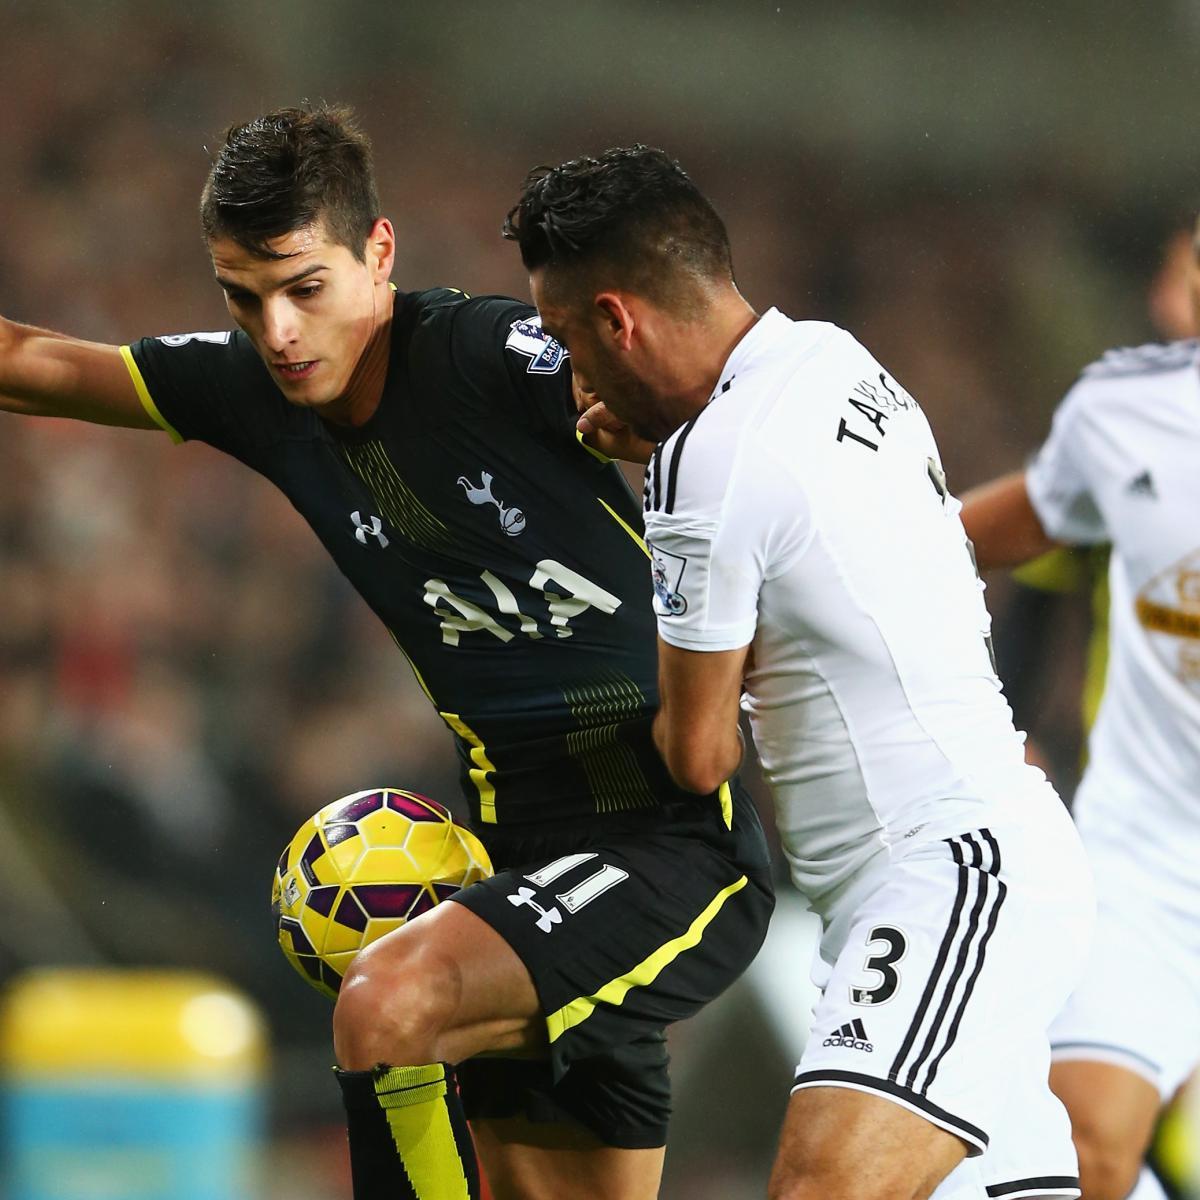 Tottenham vs. Swansea: Team News, Predicted Line-Ups, Live ...